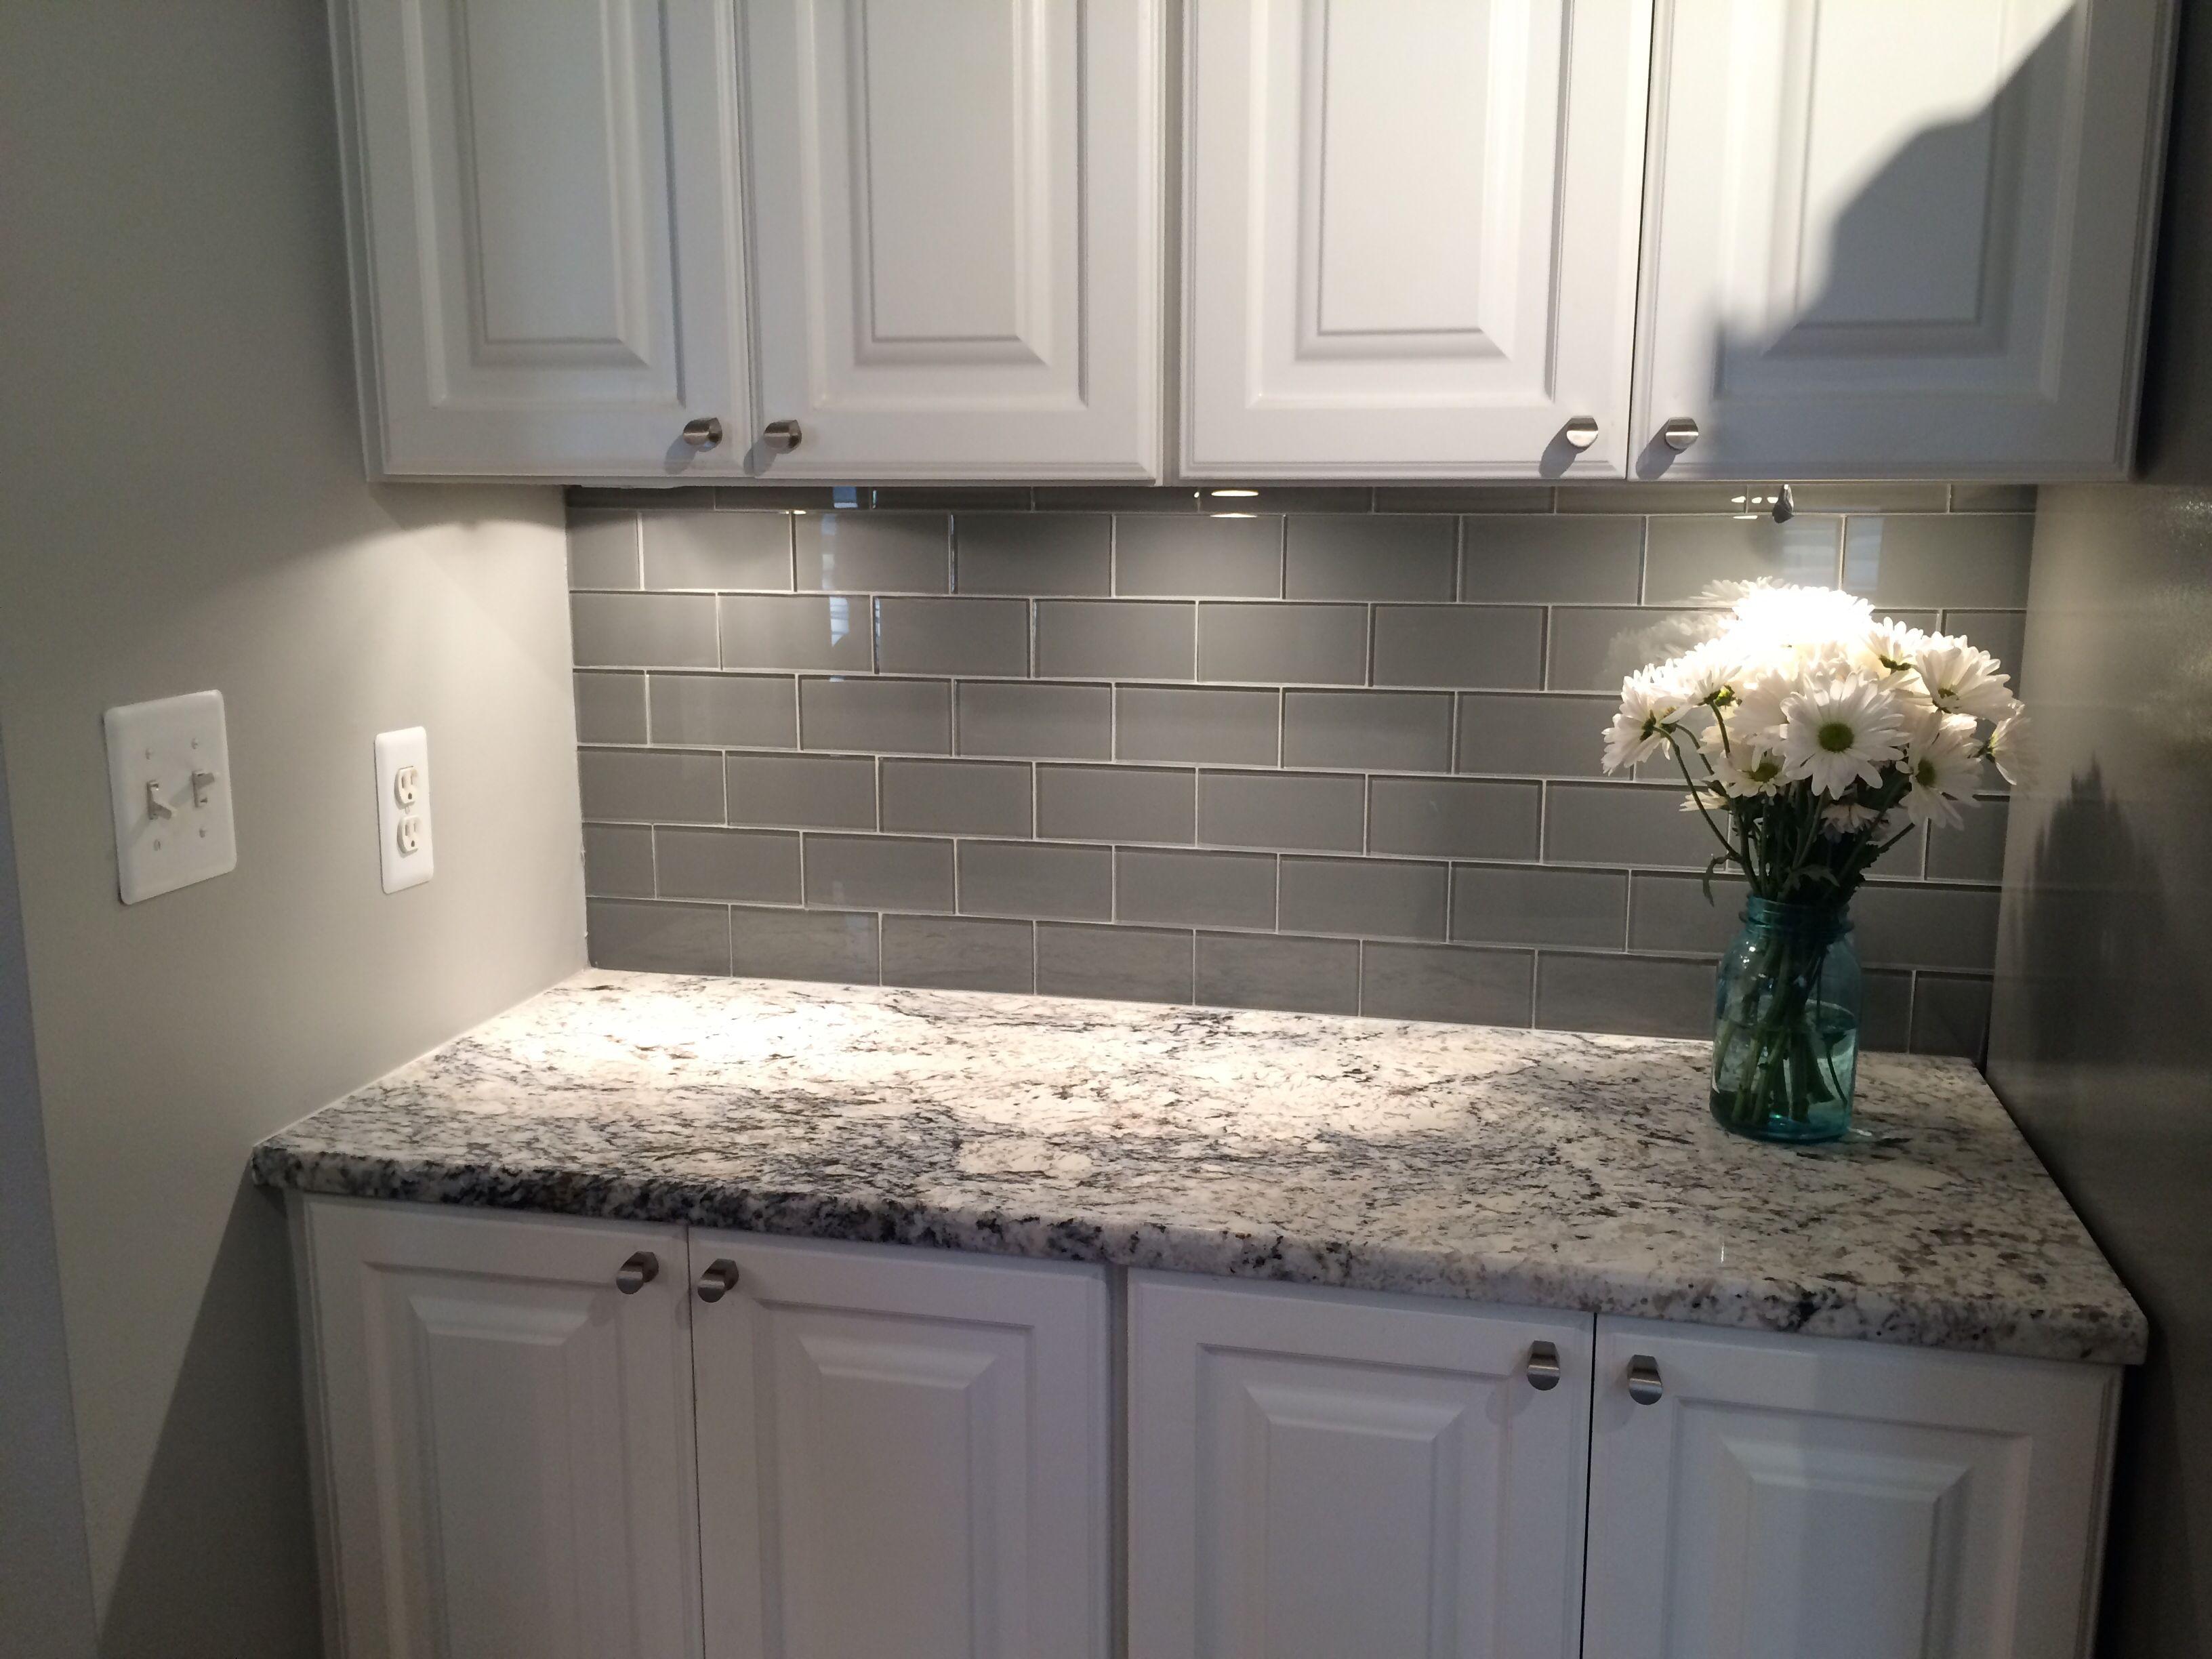 grey backsplash kitchen subway tile backsplash Grey Glass Subway Tile Backsplash And White Cabinet For Small Space